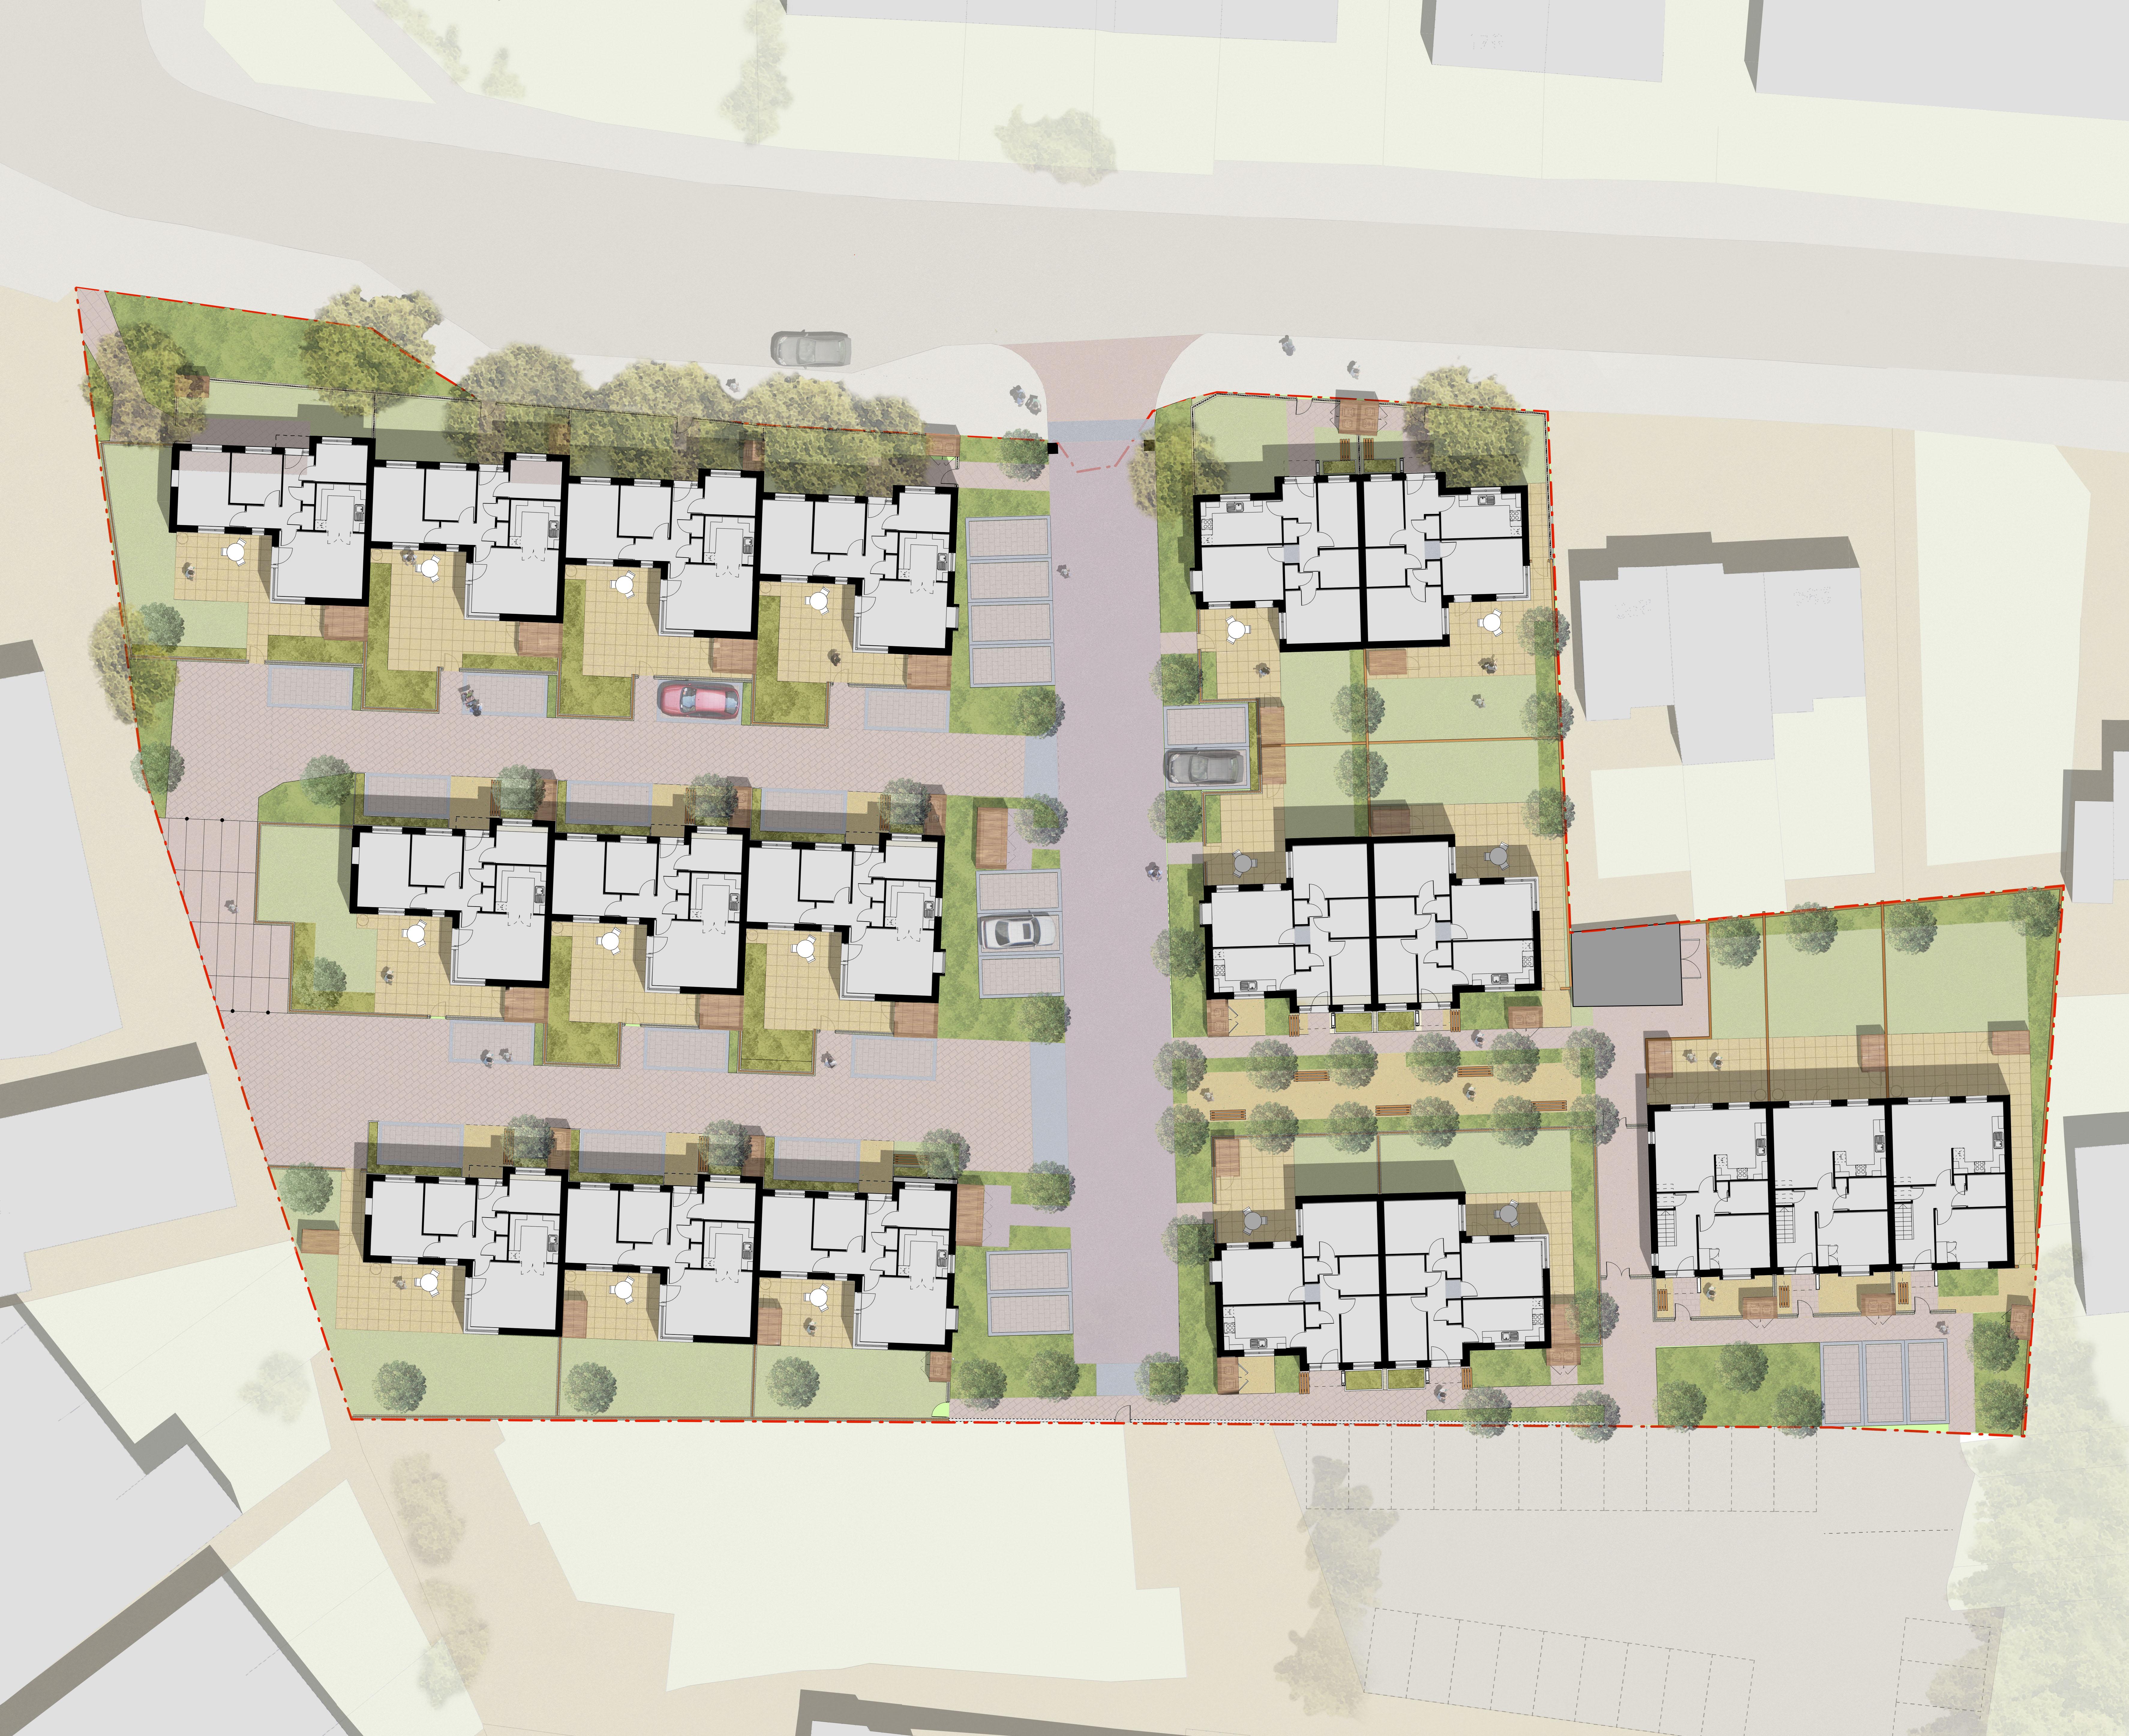 Davis Landscape Architecture Albyns Close London Residential Architect Render Masterplan Planning